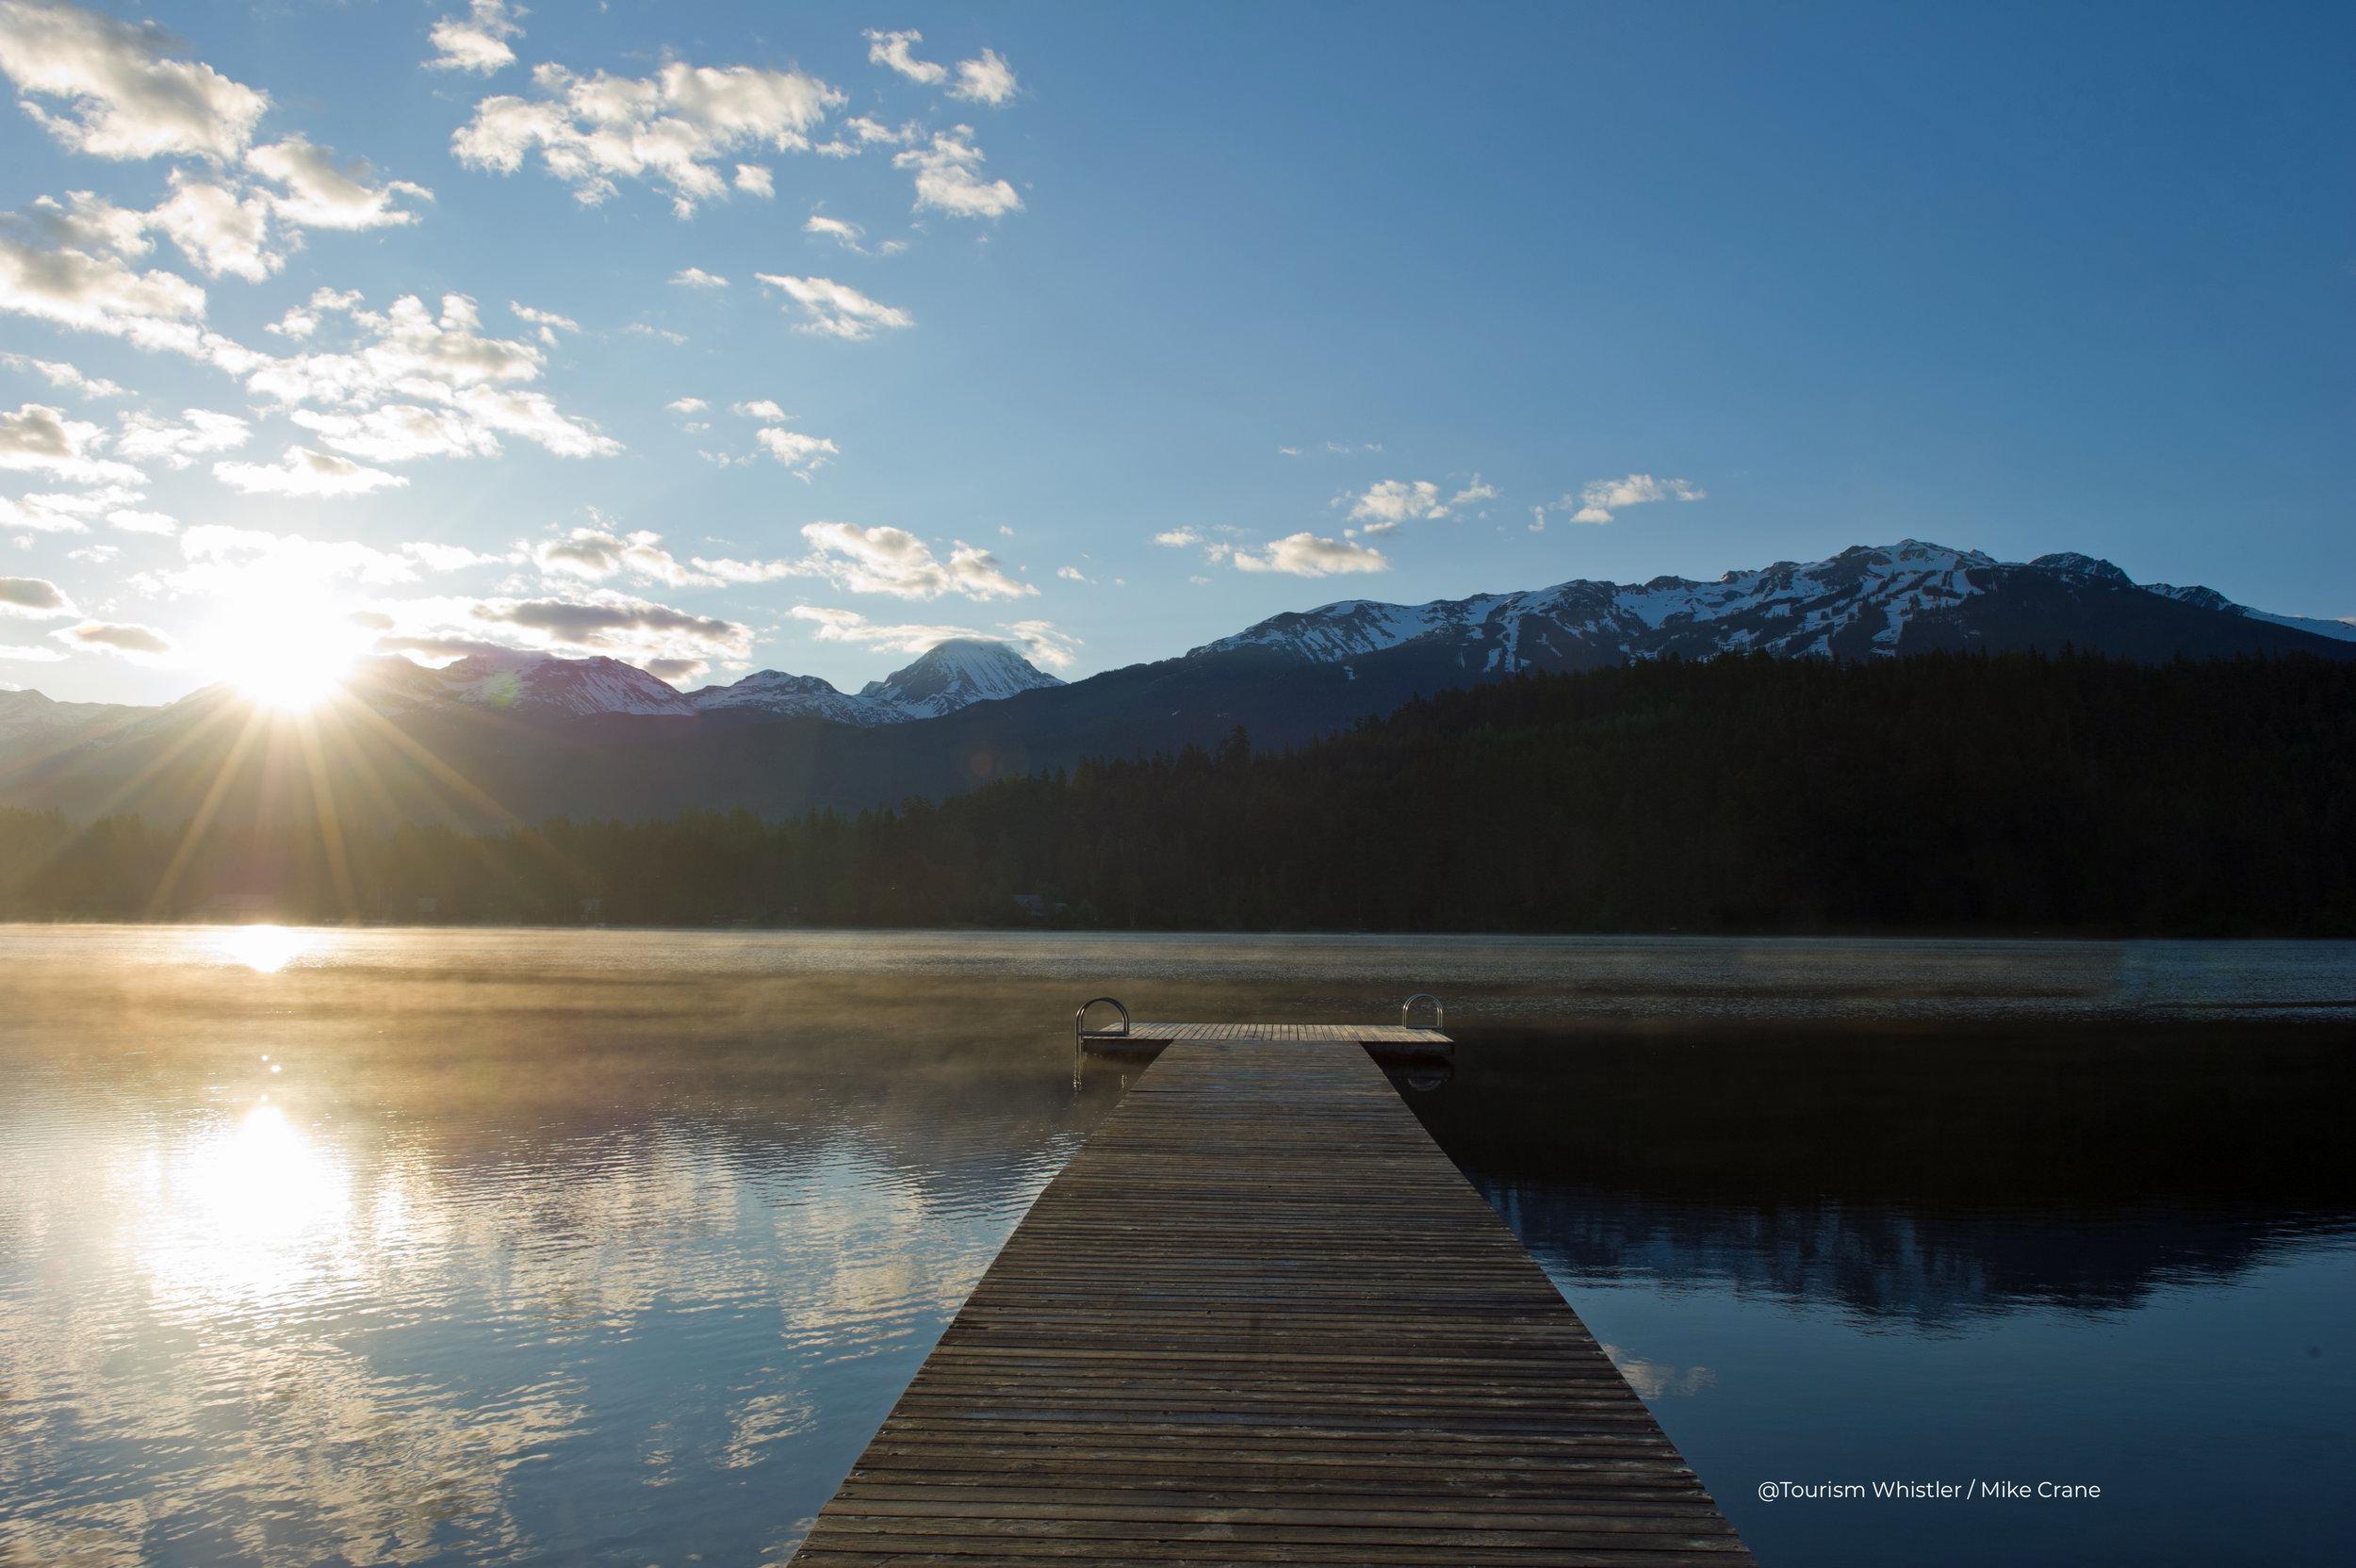 I_Alta_Lake_Dock.jpg